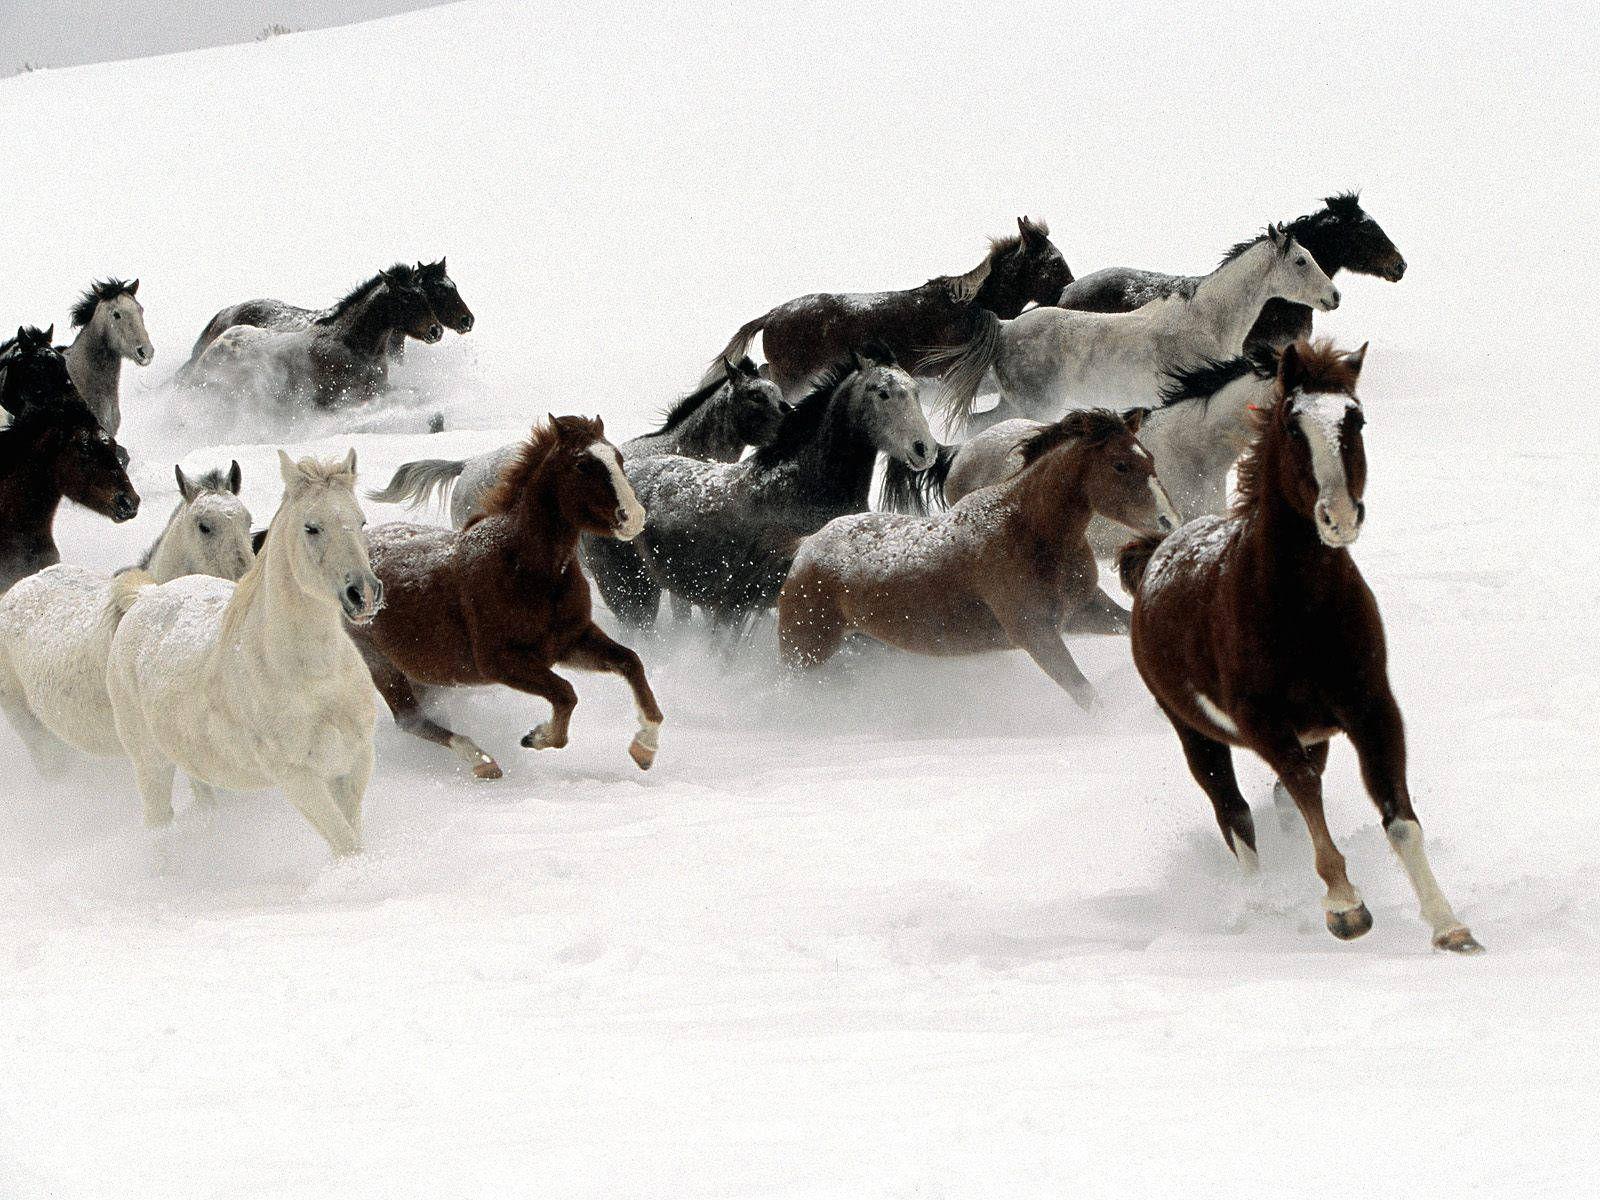 Herd Of Horses Running Snow Winter X 1024 Px